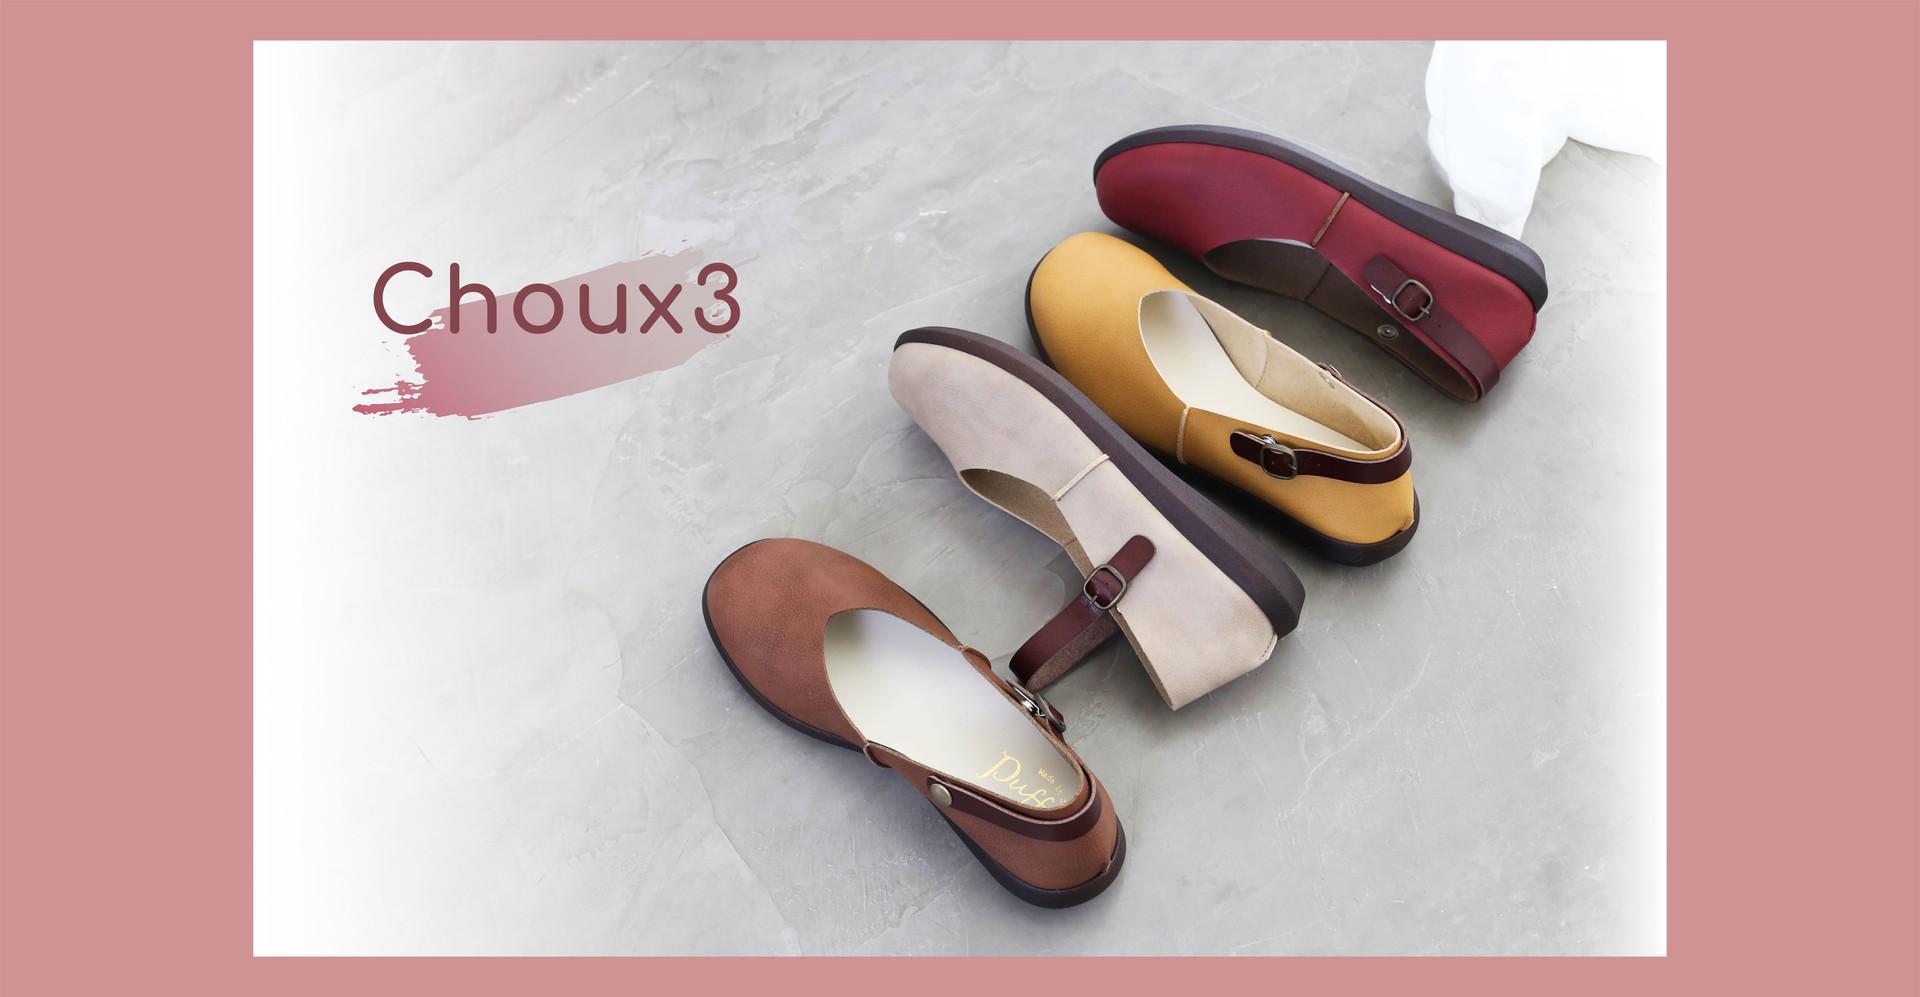 Choux3, Super Soft - 2,880 THB